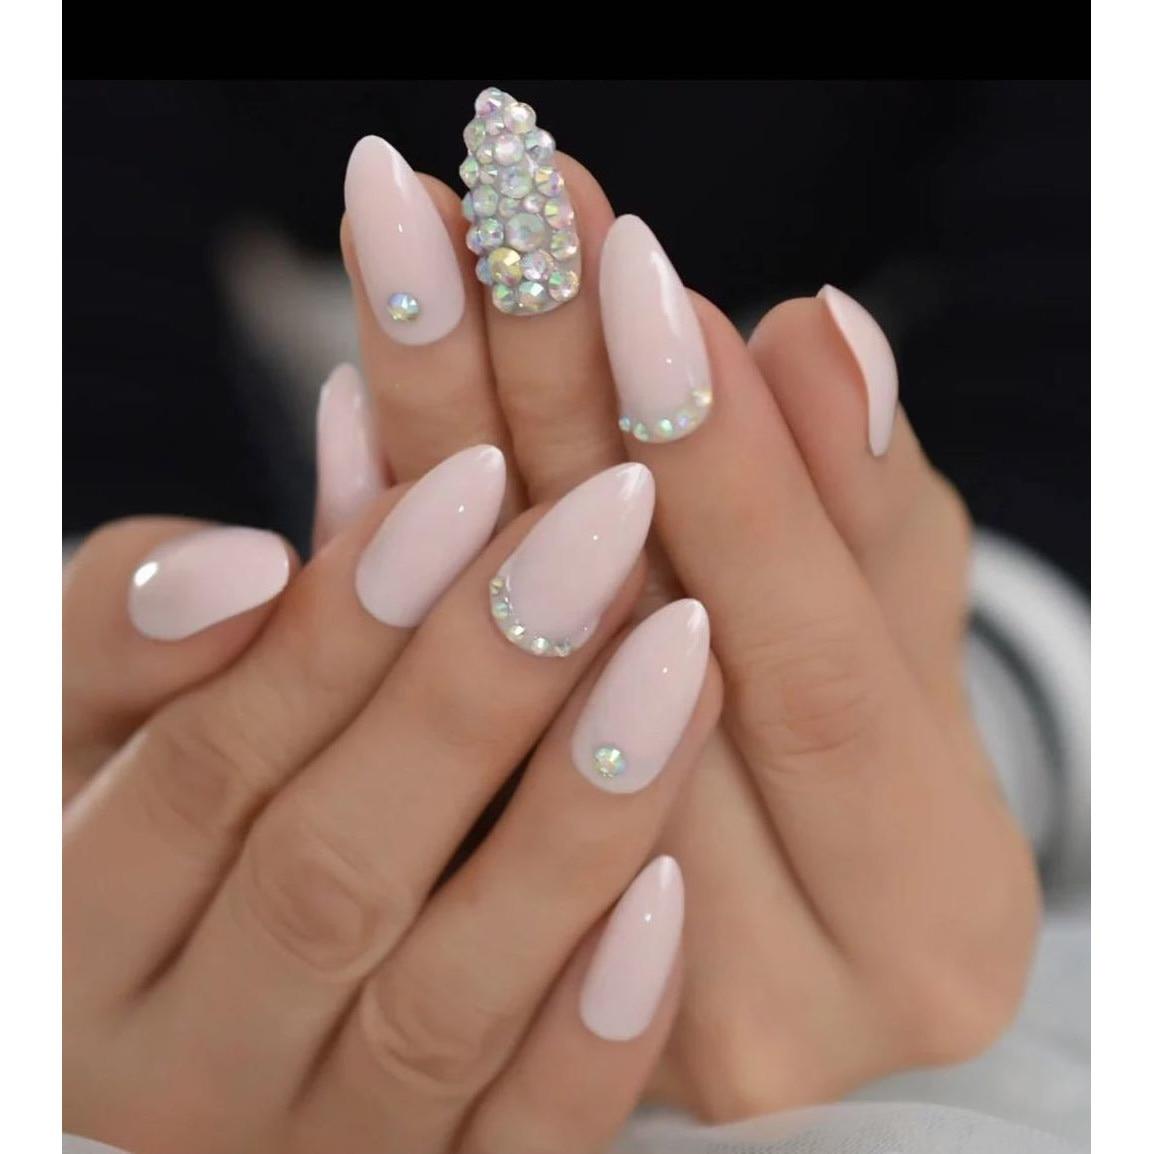 Set 24 Unghii False Autoadezive Tip Cu Adeziv Tipsuri Balerina Cu Model Glossy Roz Diamond Emag Ro